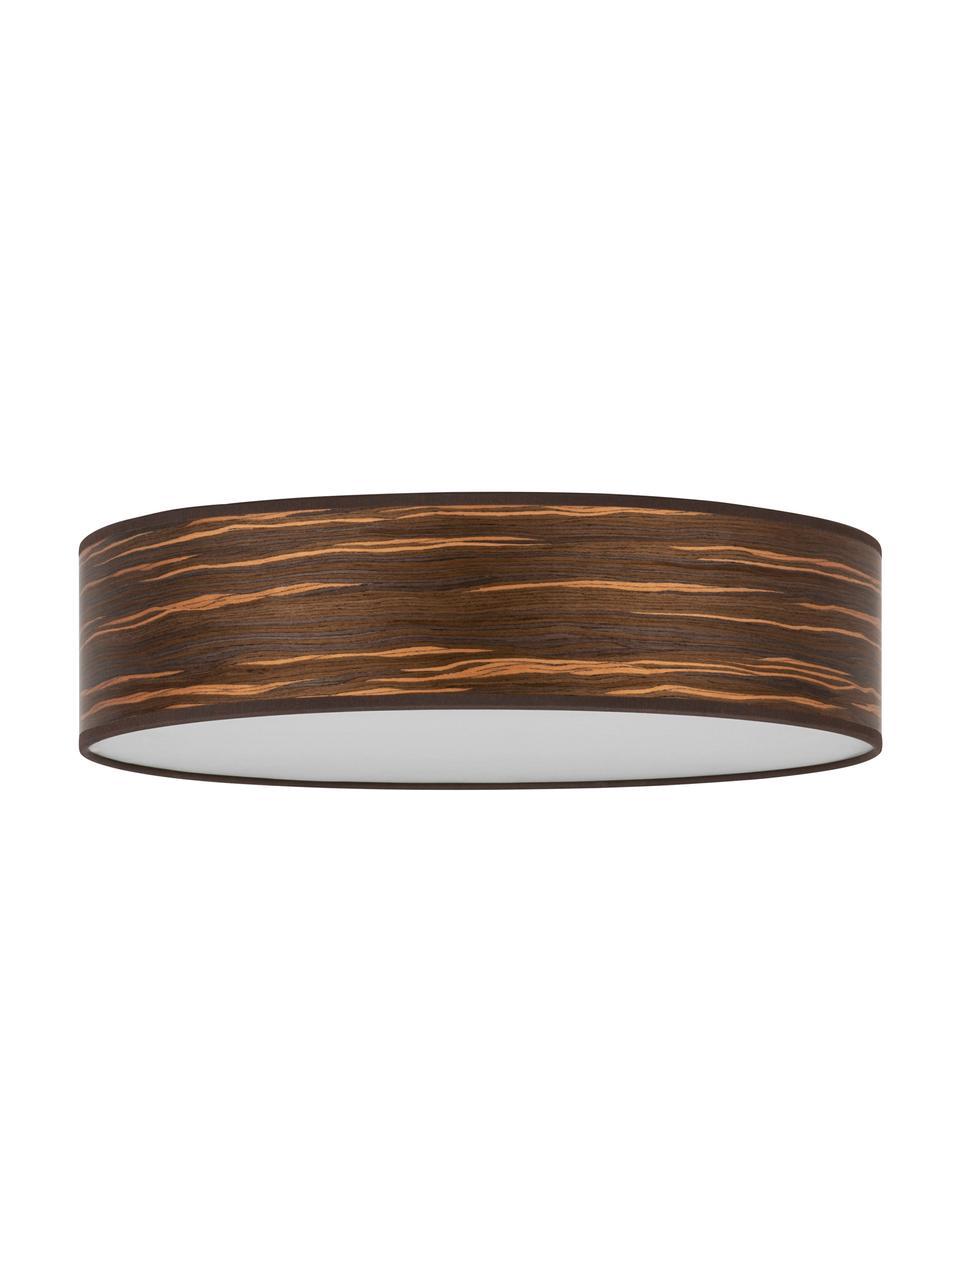 Deckenleuchte Ocho aus Holz, Lampenschirm: Holz, Holz, Weiß, Ø 40 x H 11 cm